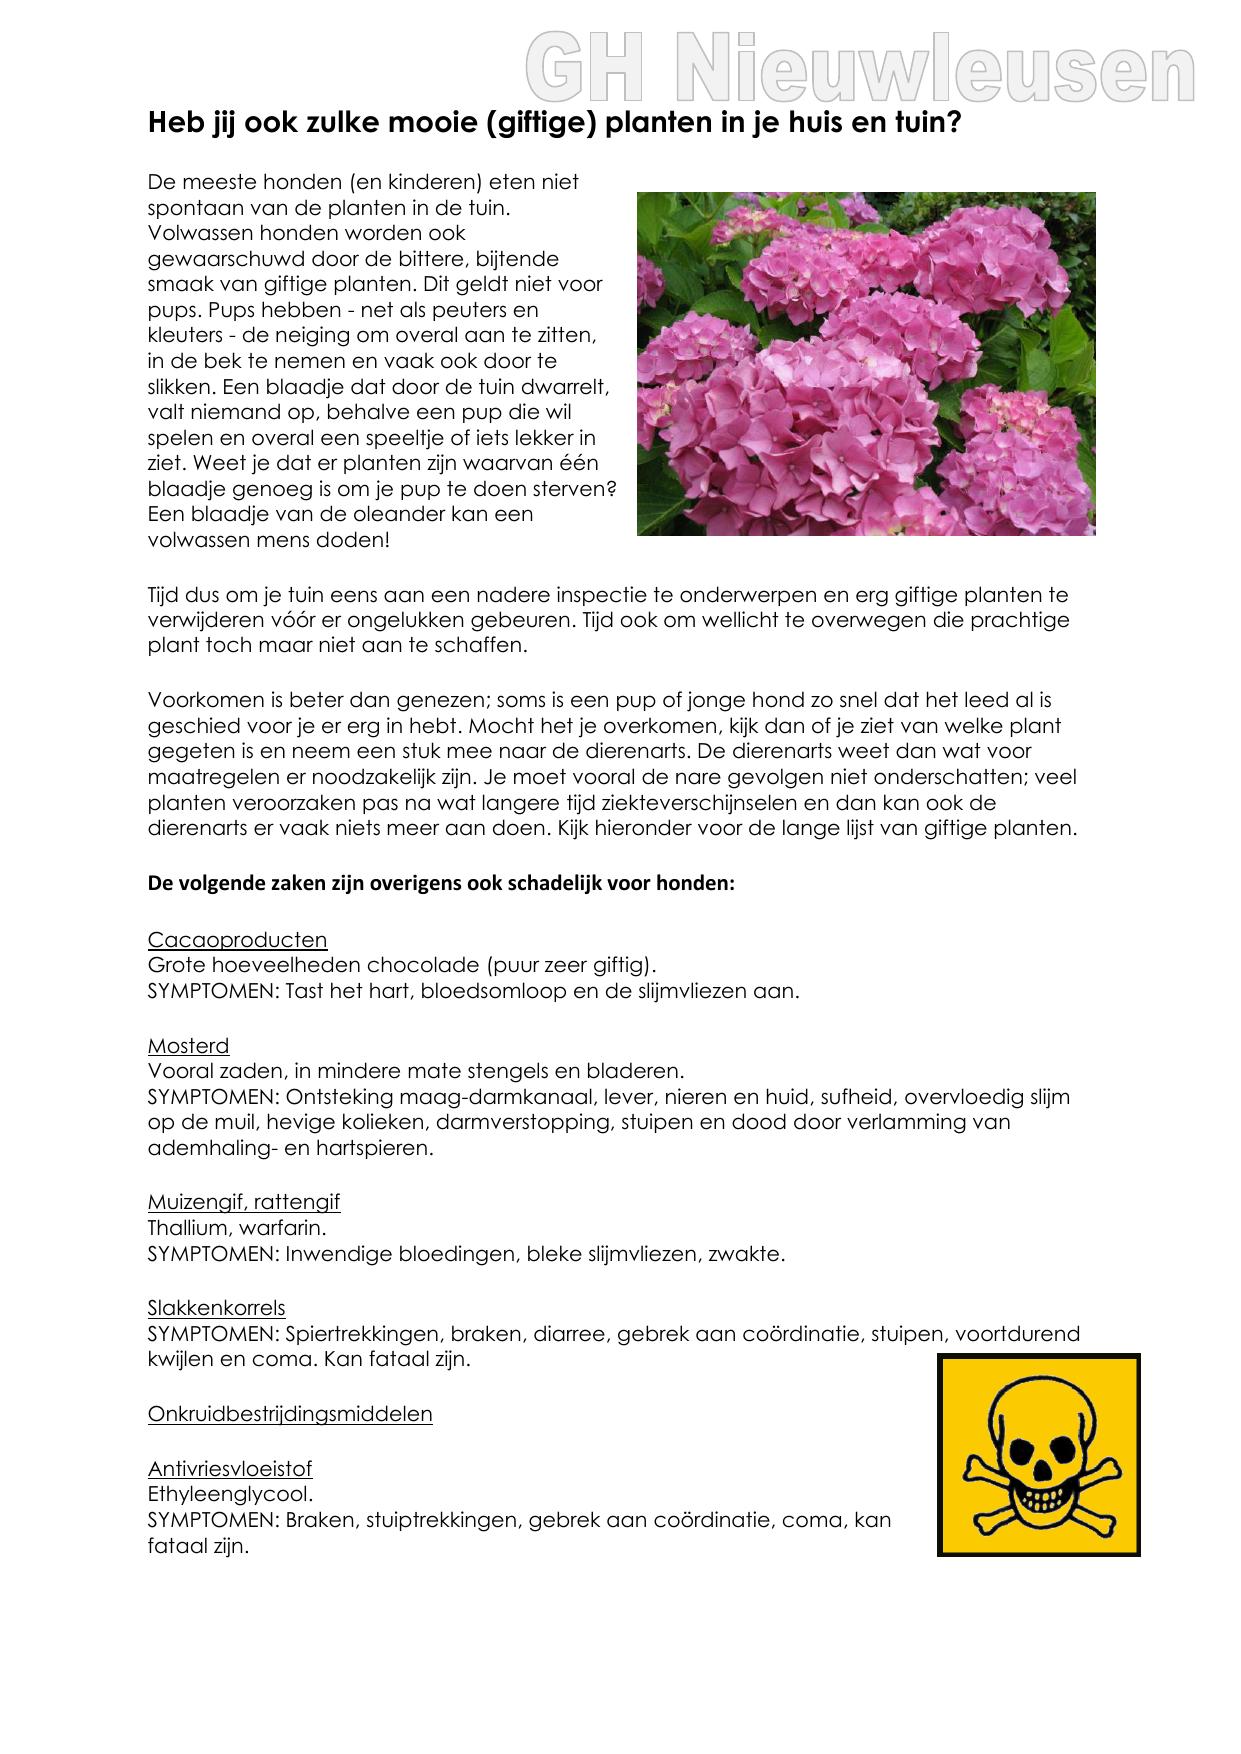 kamperfoelie giftig voor honden